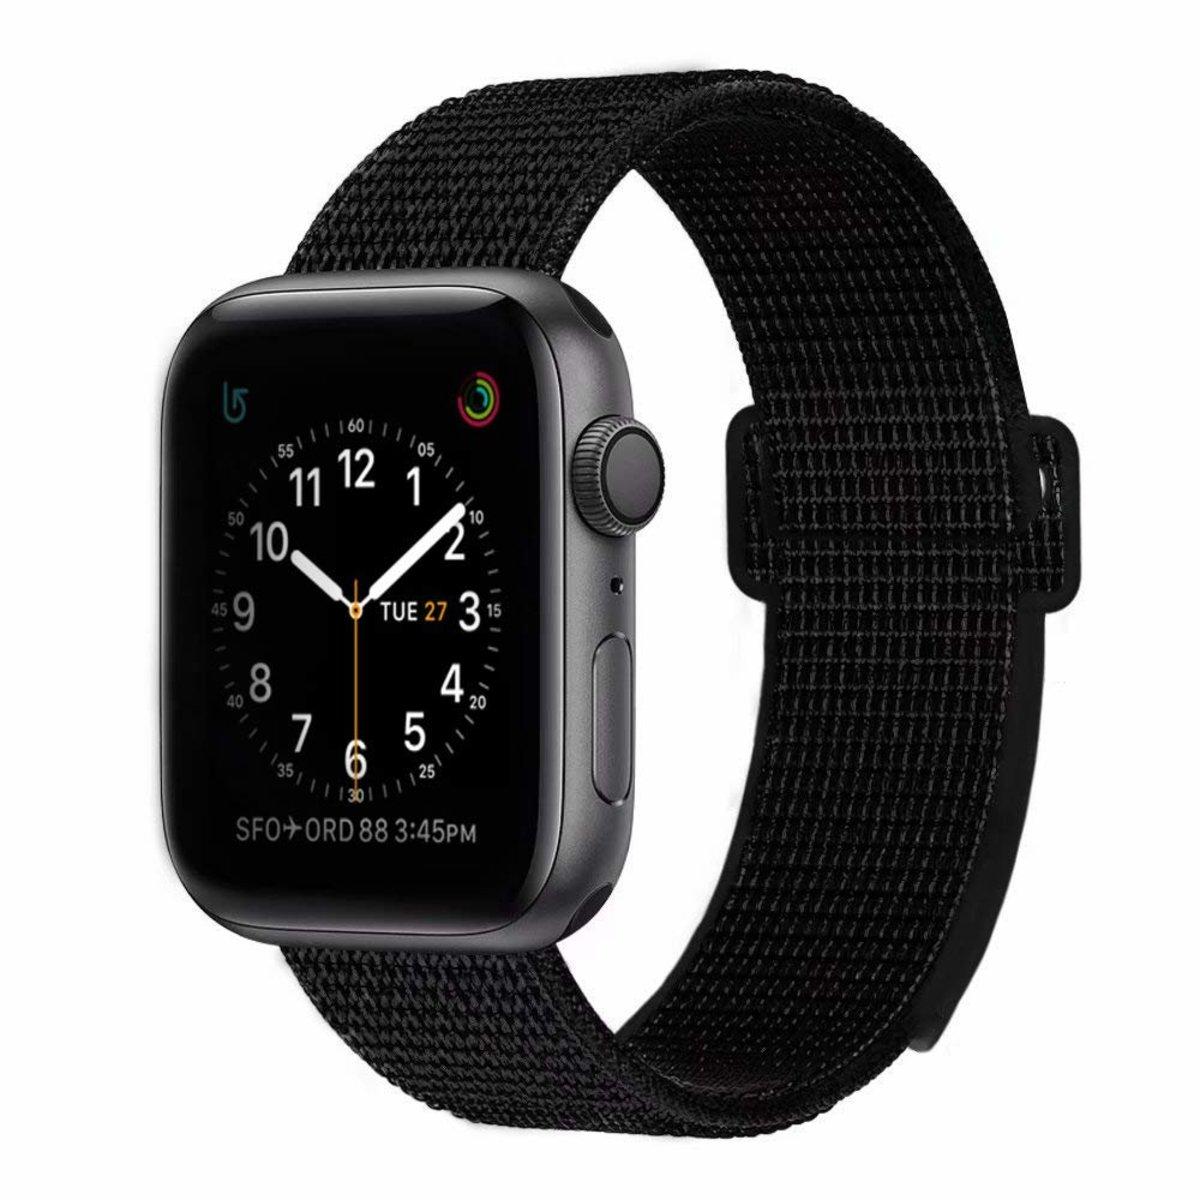 42mm/44mm適用透氣編織尼龍回環式運動錶帶 Apple Watch 1/2/3/4/5